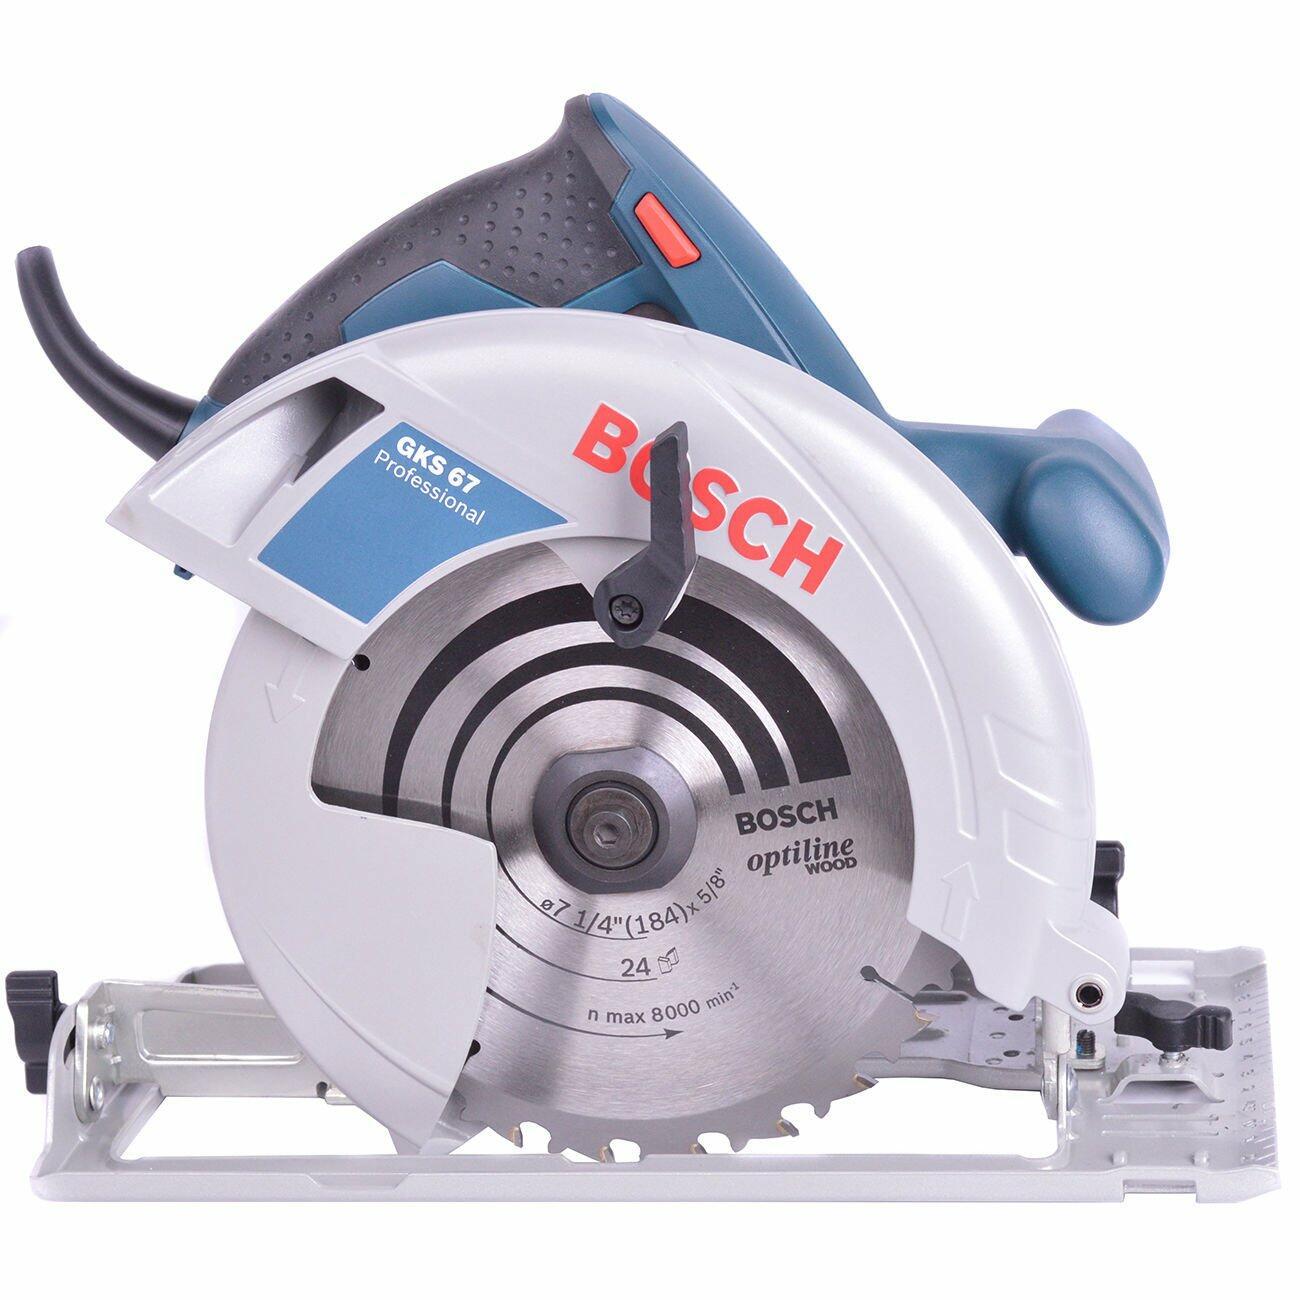 "Serra Circular 7.1/4"" 1600W GKS 67 Bosch - 220V"